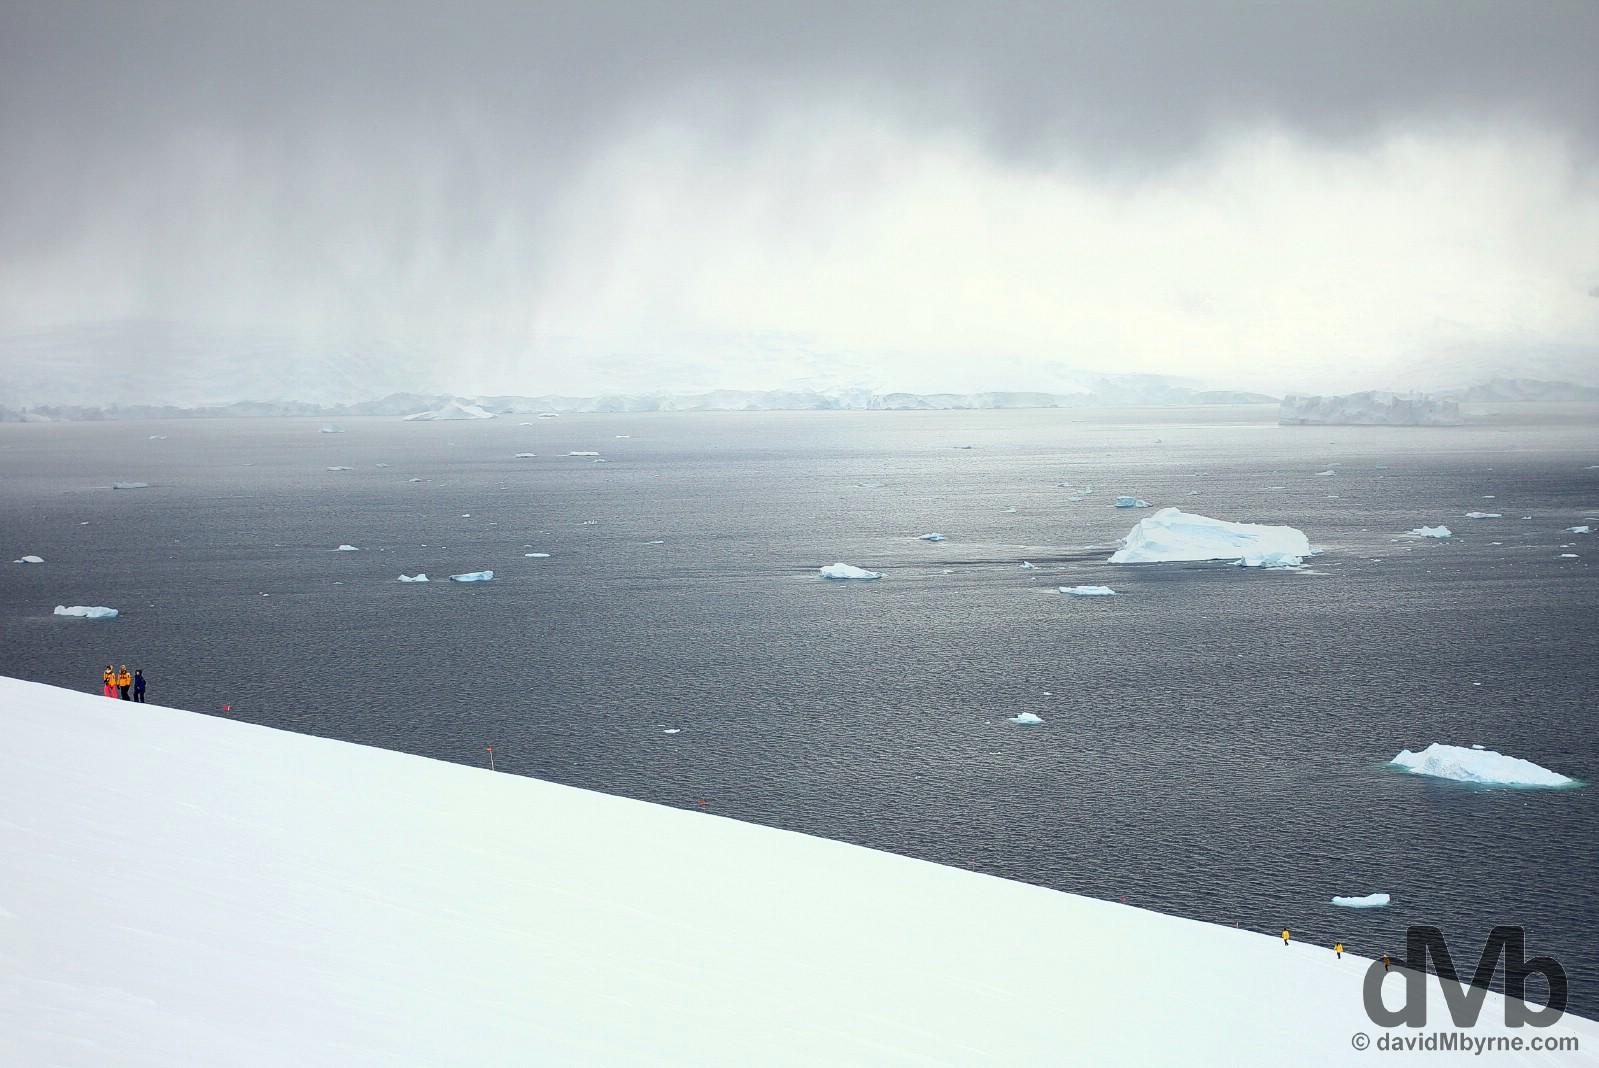 Neko Harbour, Antarctic Peninsula. November 30, 2015.